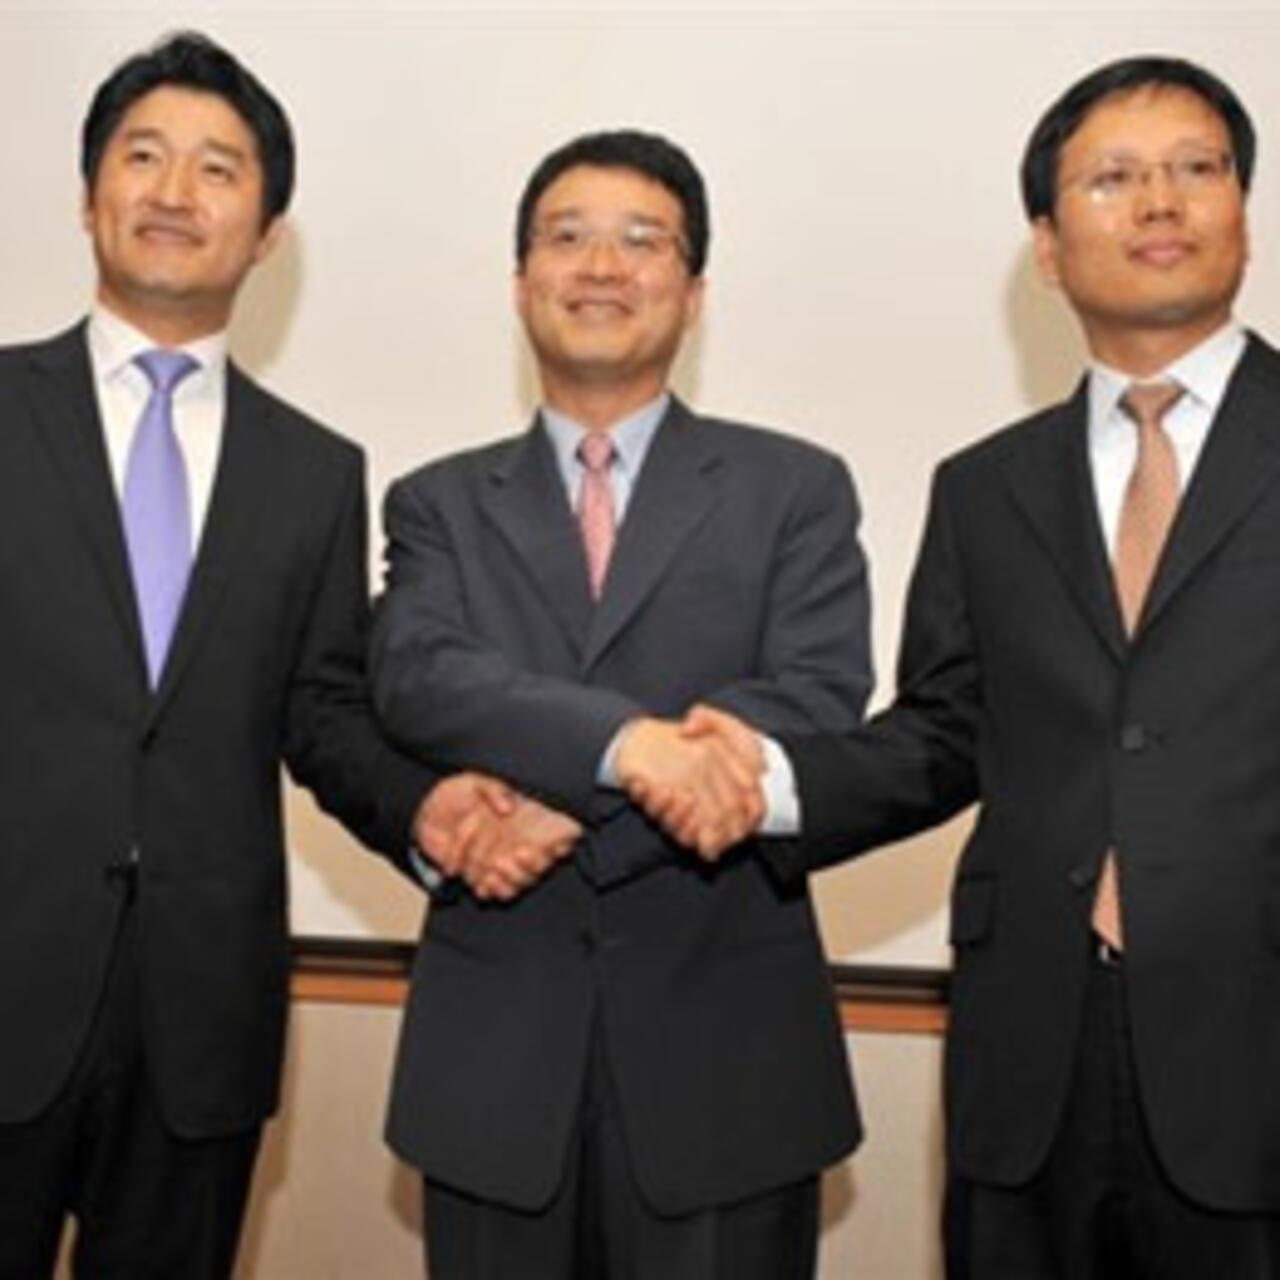 Ebay Buys Into South Korean Market